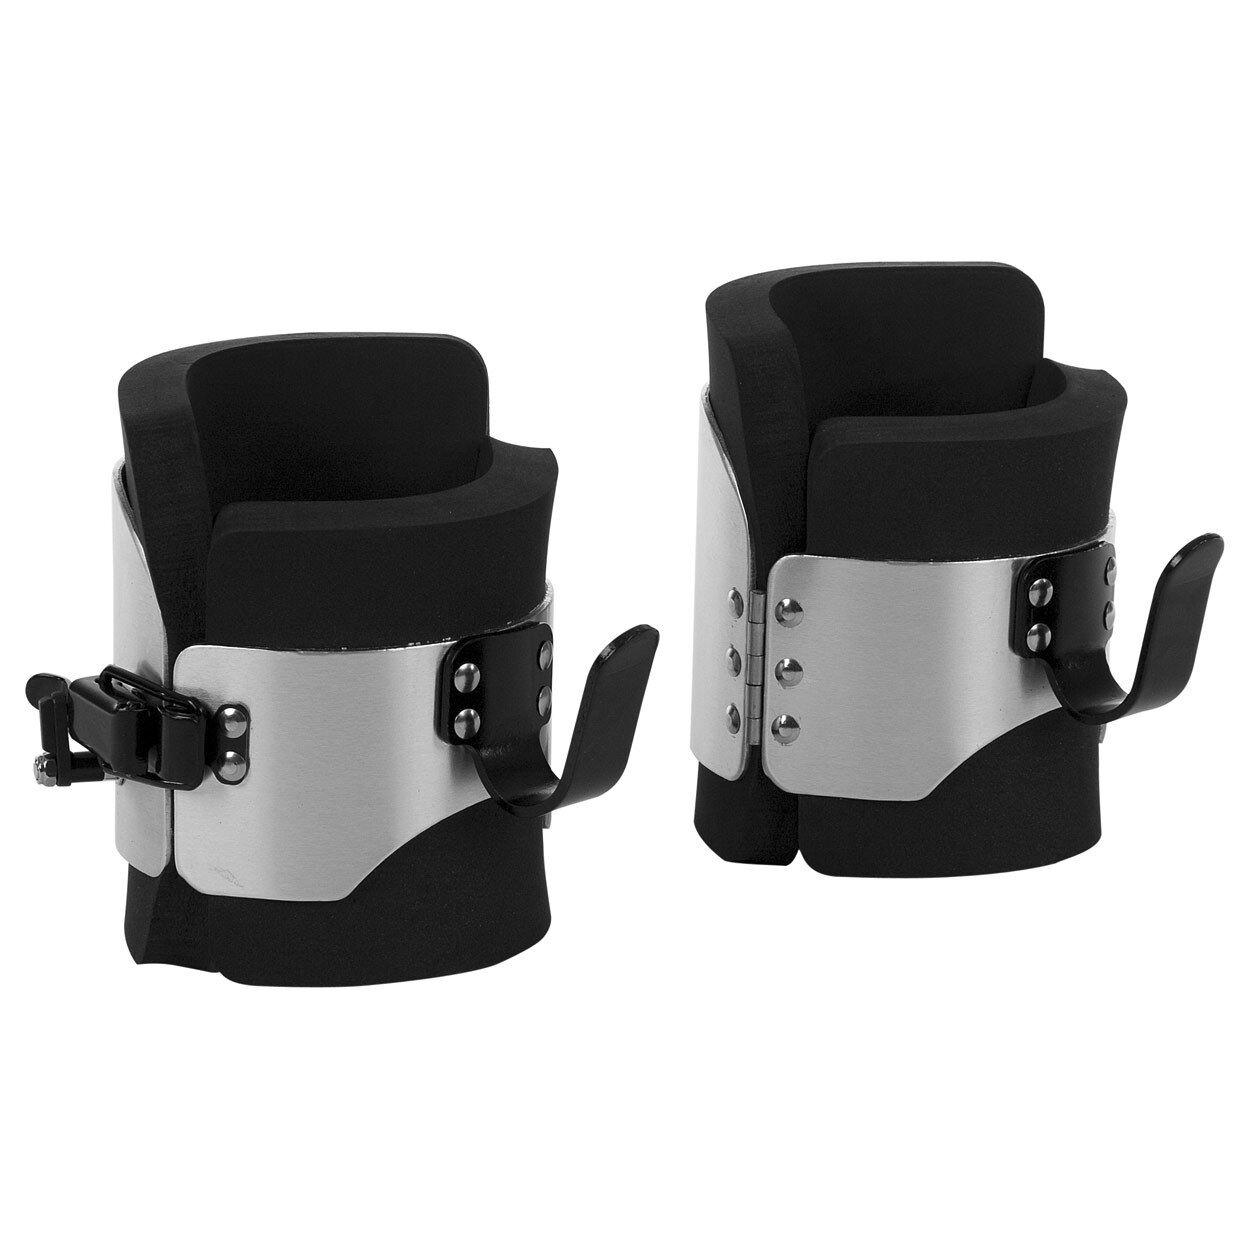 Profi Gravity Boots mit Sicherheitsverschluss Inversion-Boots Hängeschuhe, Gr. L